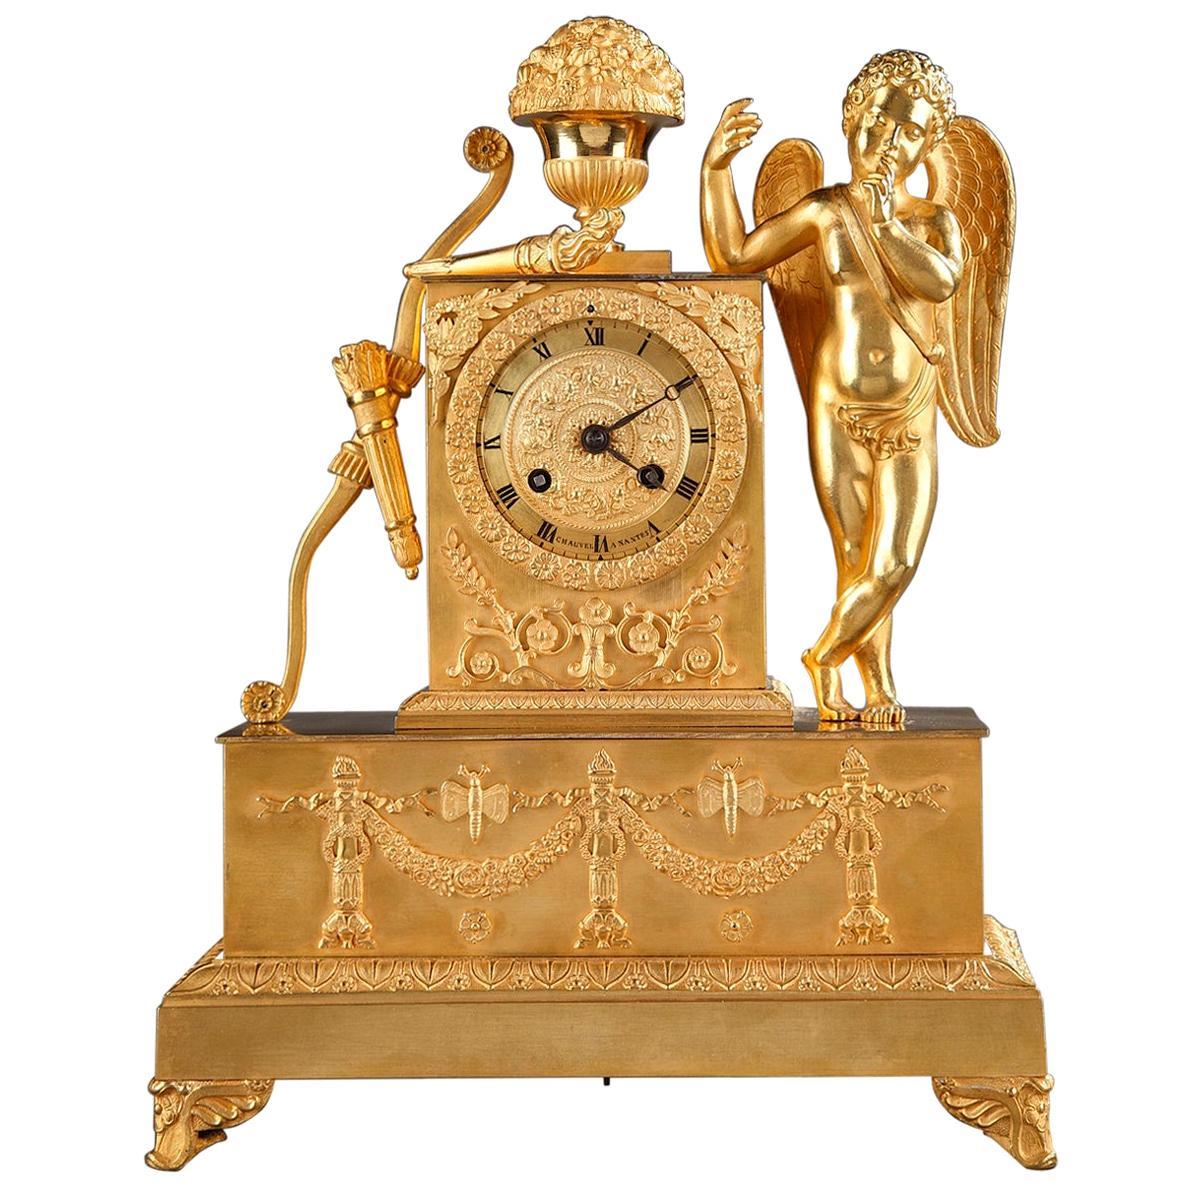 Early 19th Century Figural Restauration Mantel Clock